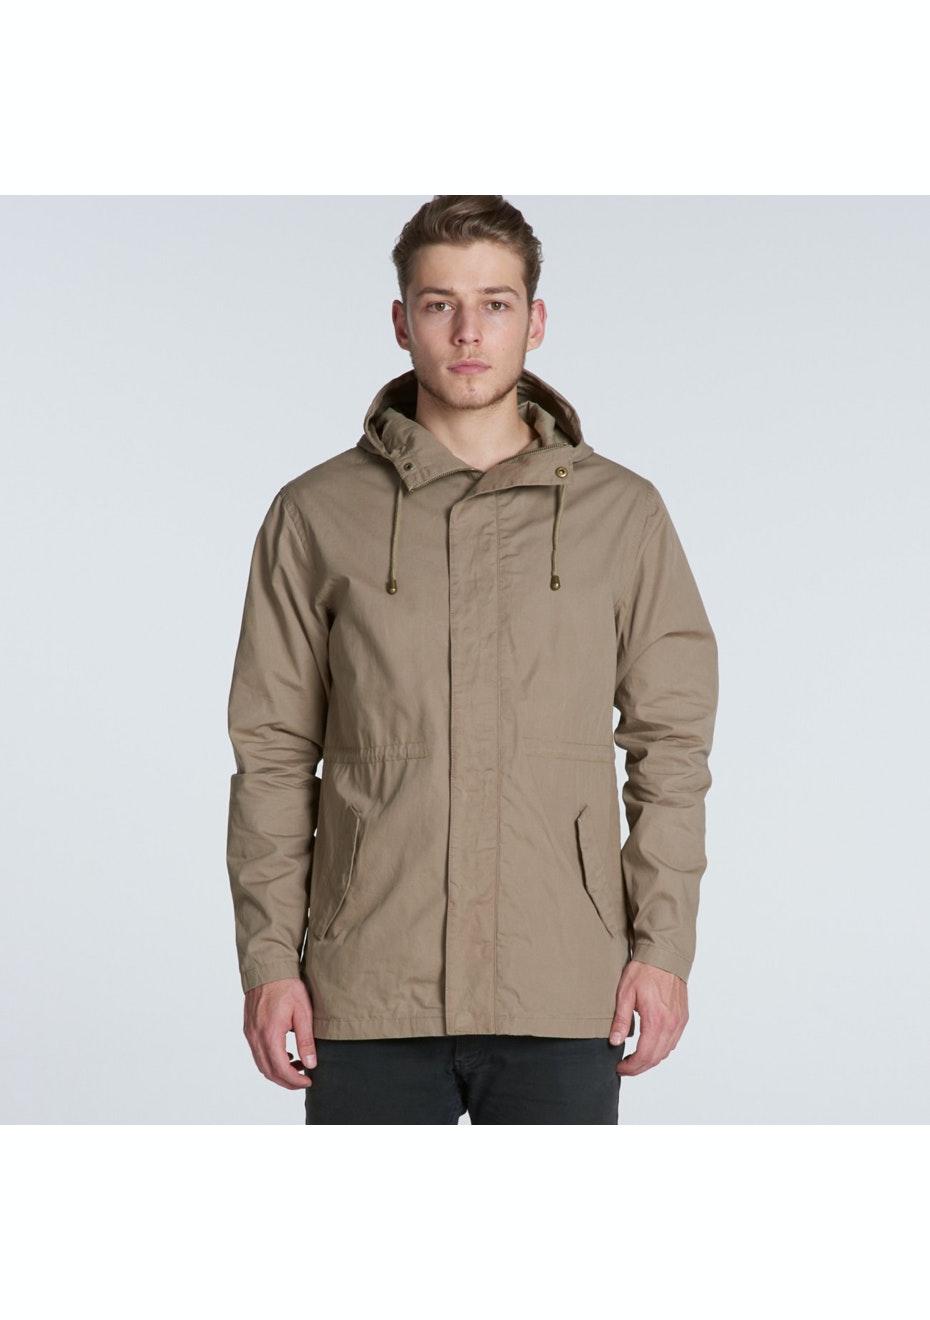 As Colour - Nomad Jacket Mens - Olive